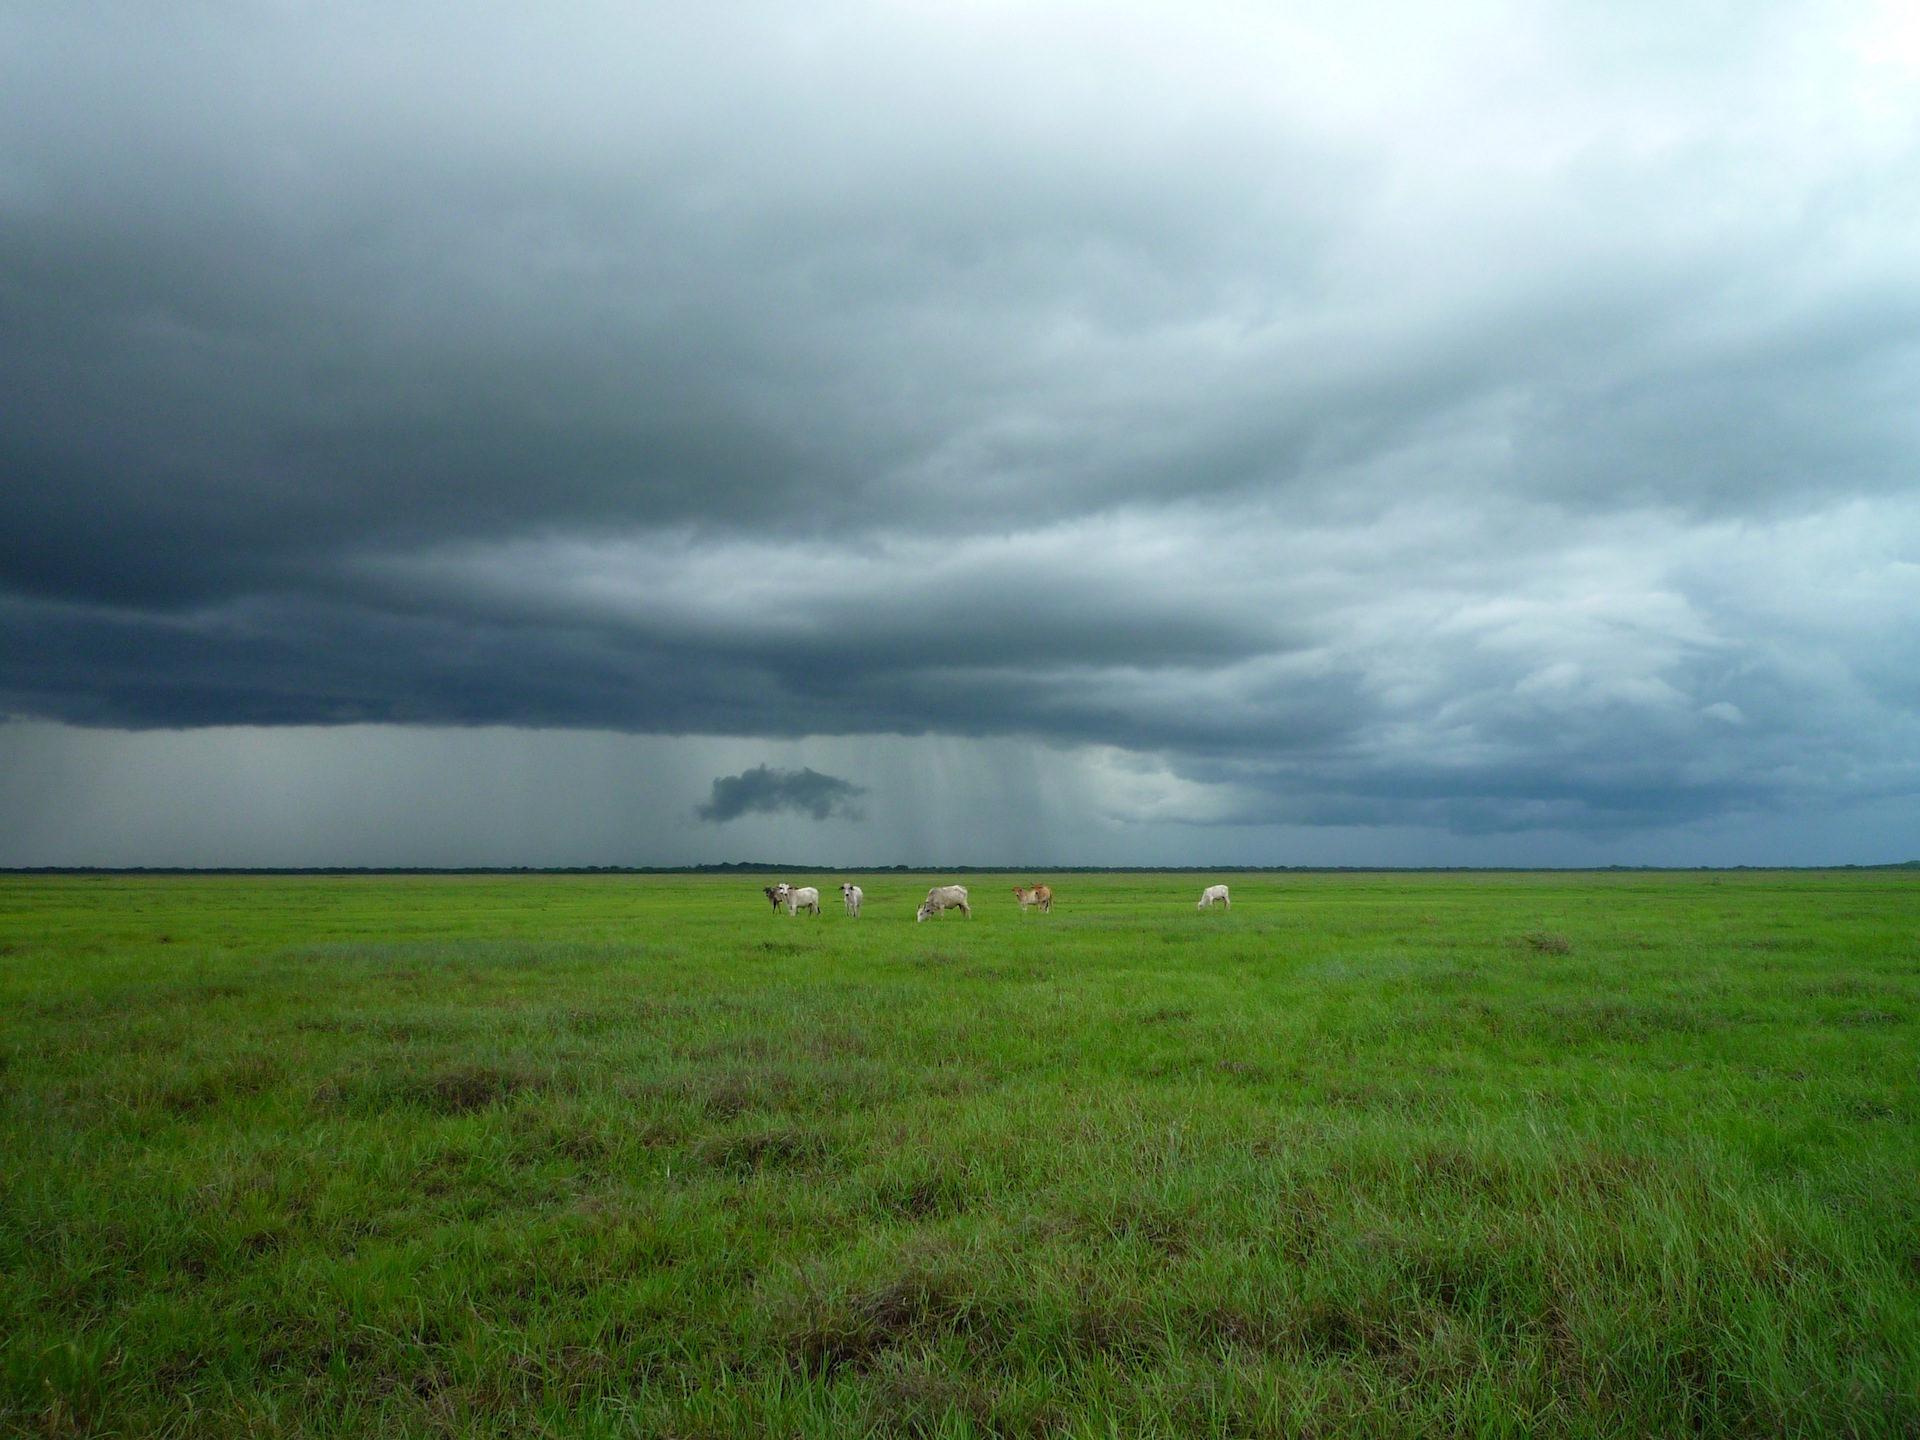 pianura, bestiame, nuvole, Tempesta, temporale - Sfondi HD - Professor-falken.com